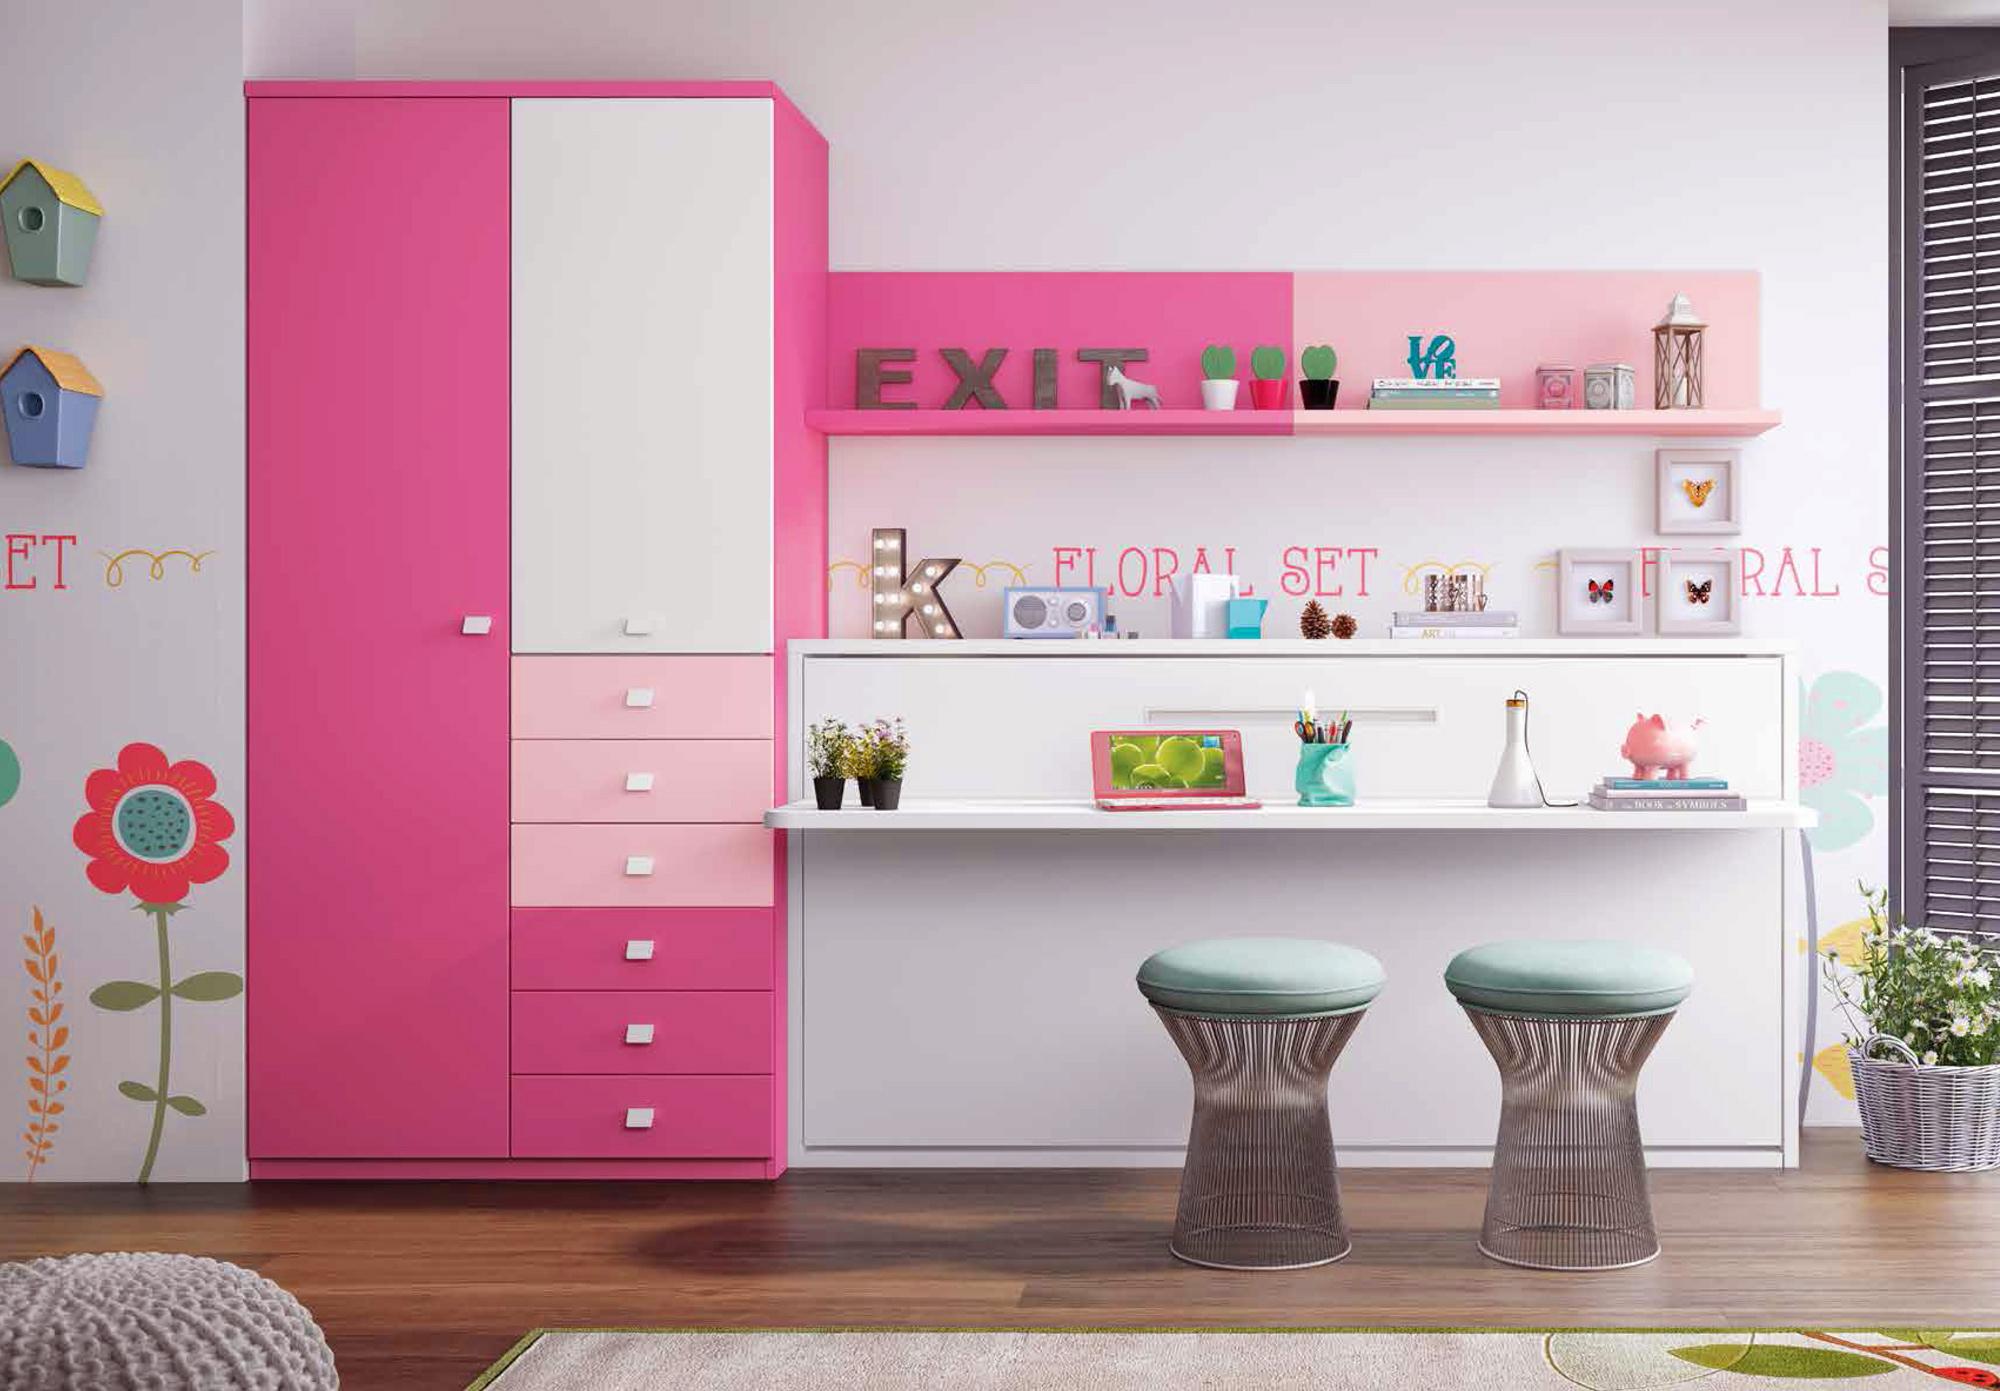 lit escamotable plafond fashion designs. Black Bedroom Furniture Sets. Home Design Ideas